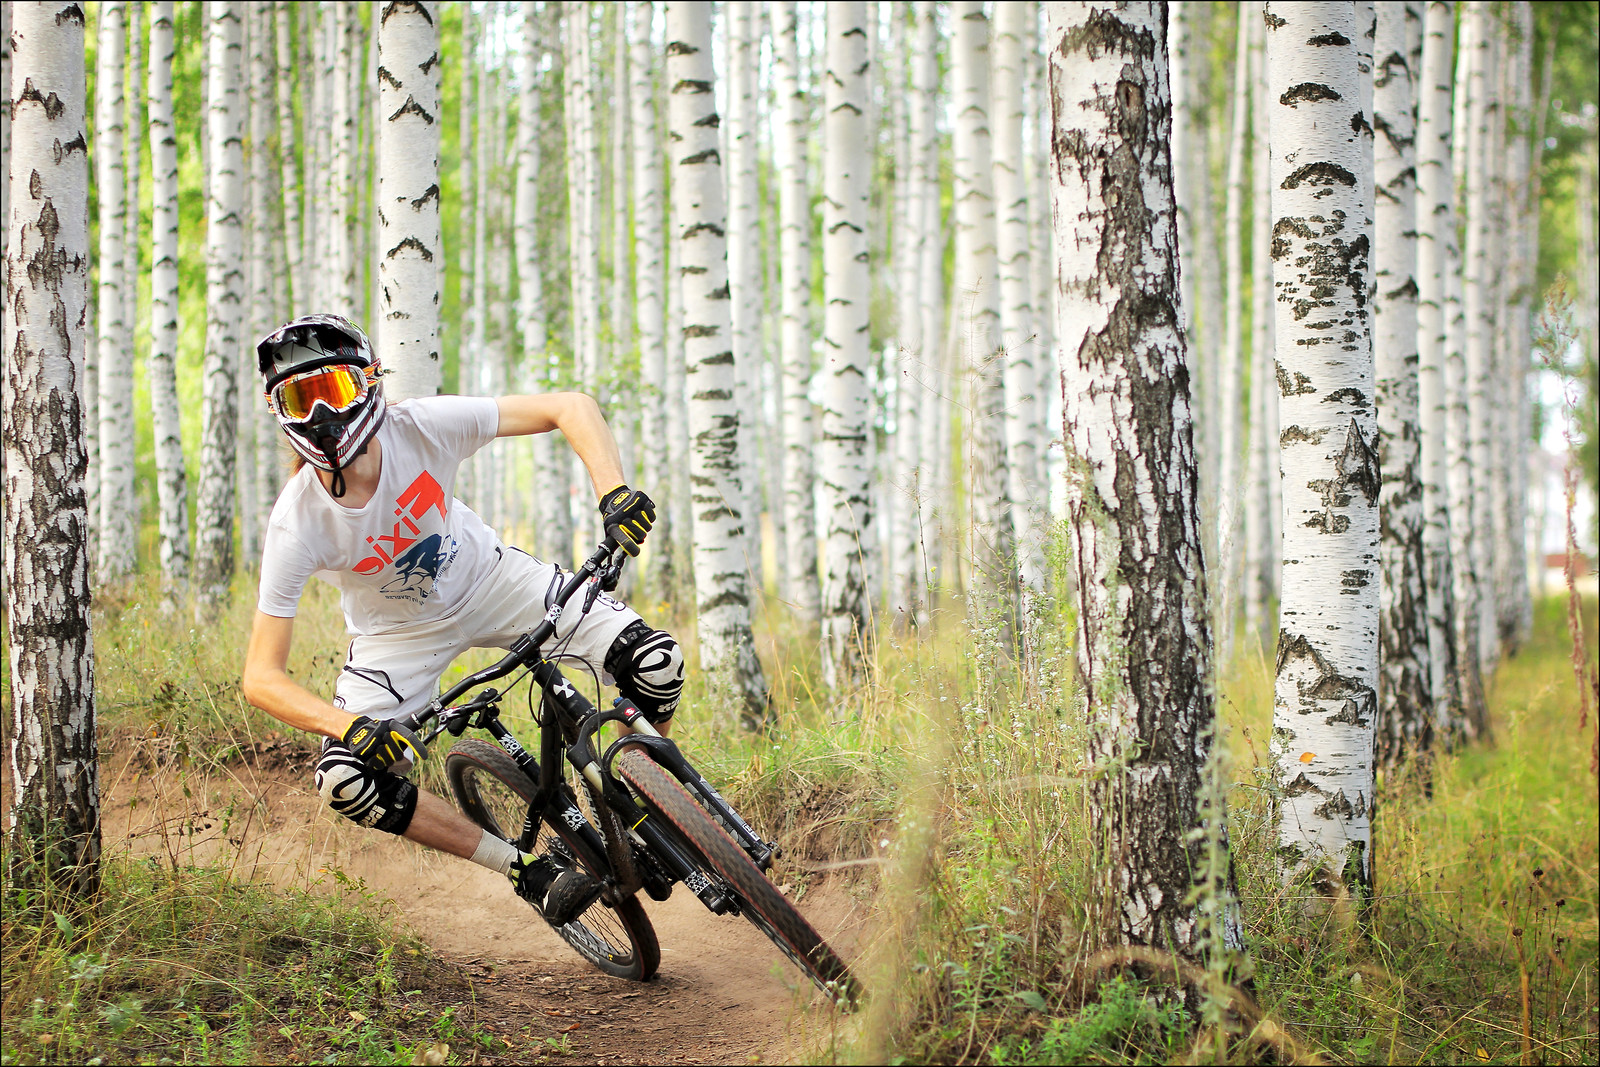 IMG 9917 - YakuT - Mountain Biking Pictures - Vital MTB